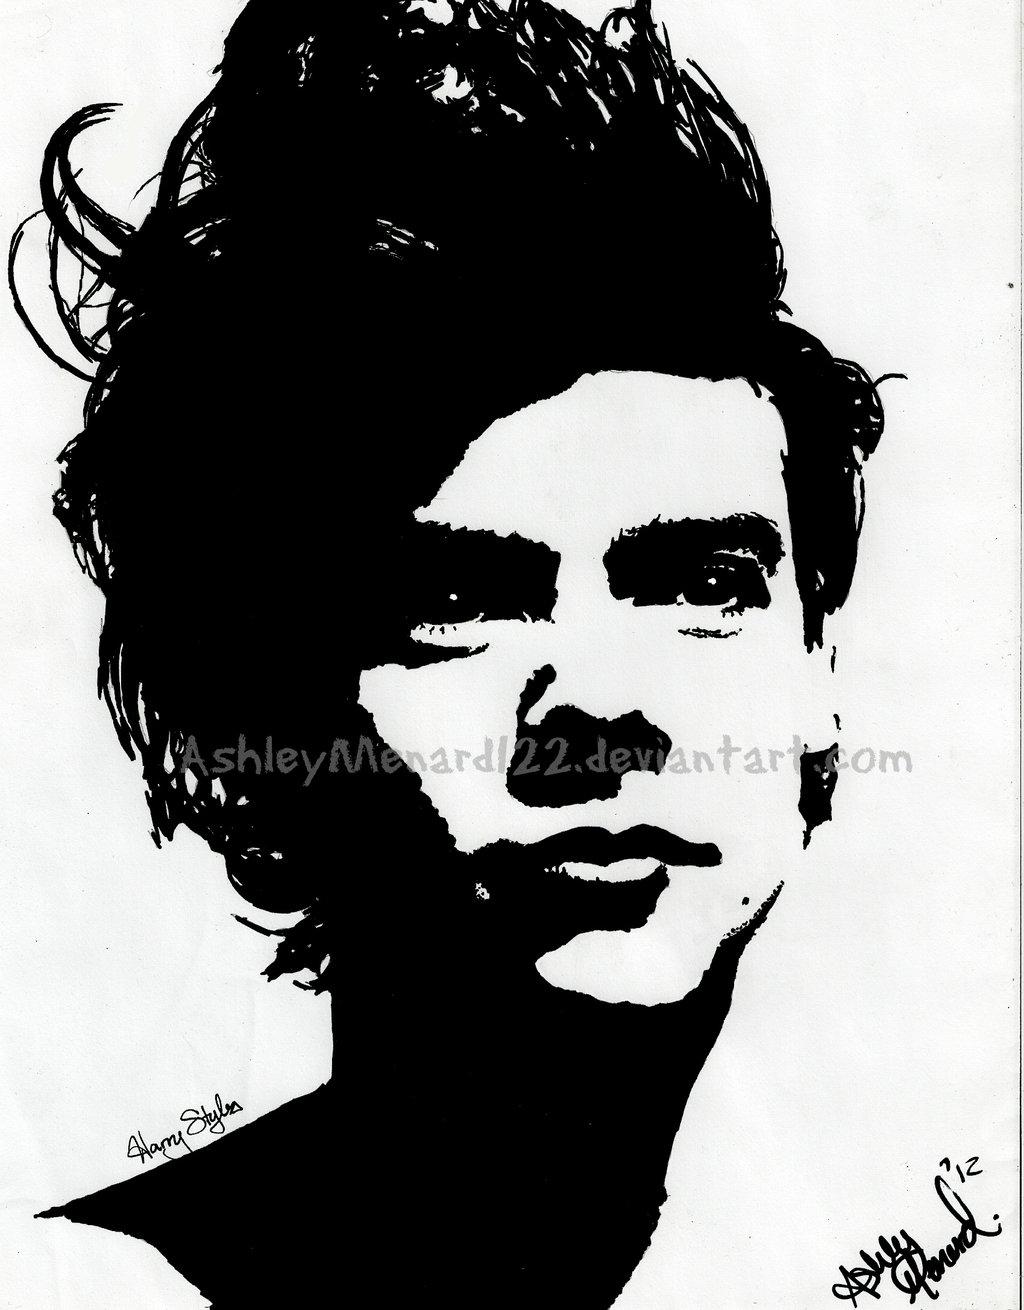 1024x1310 Harry Stylese Direction By Ashleymenard122